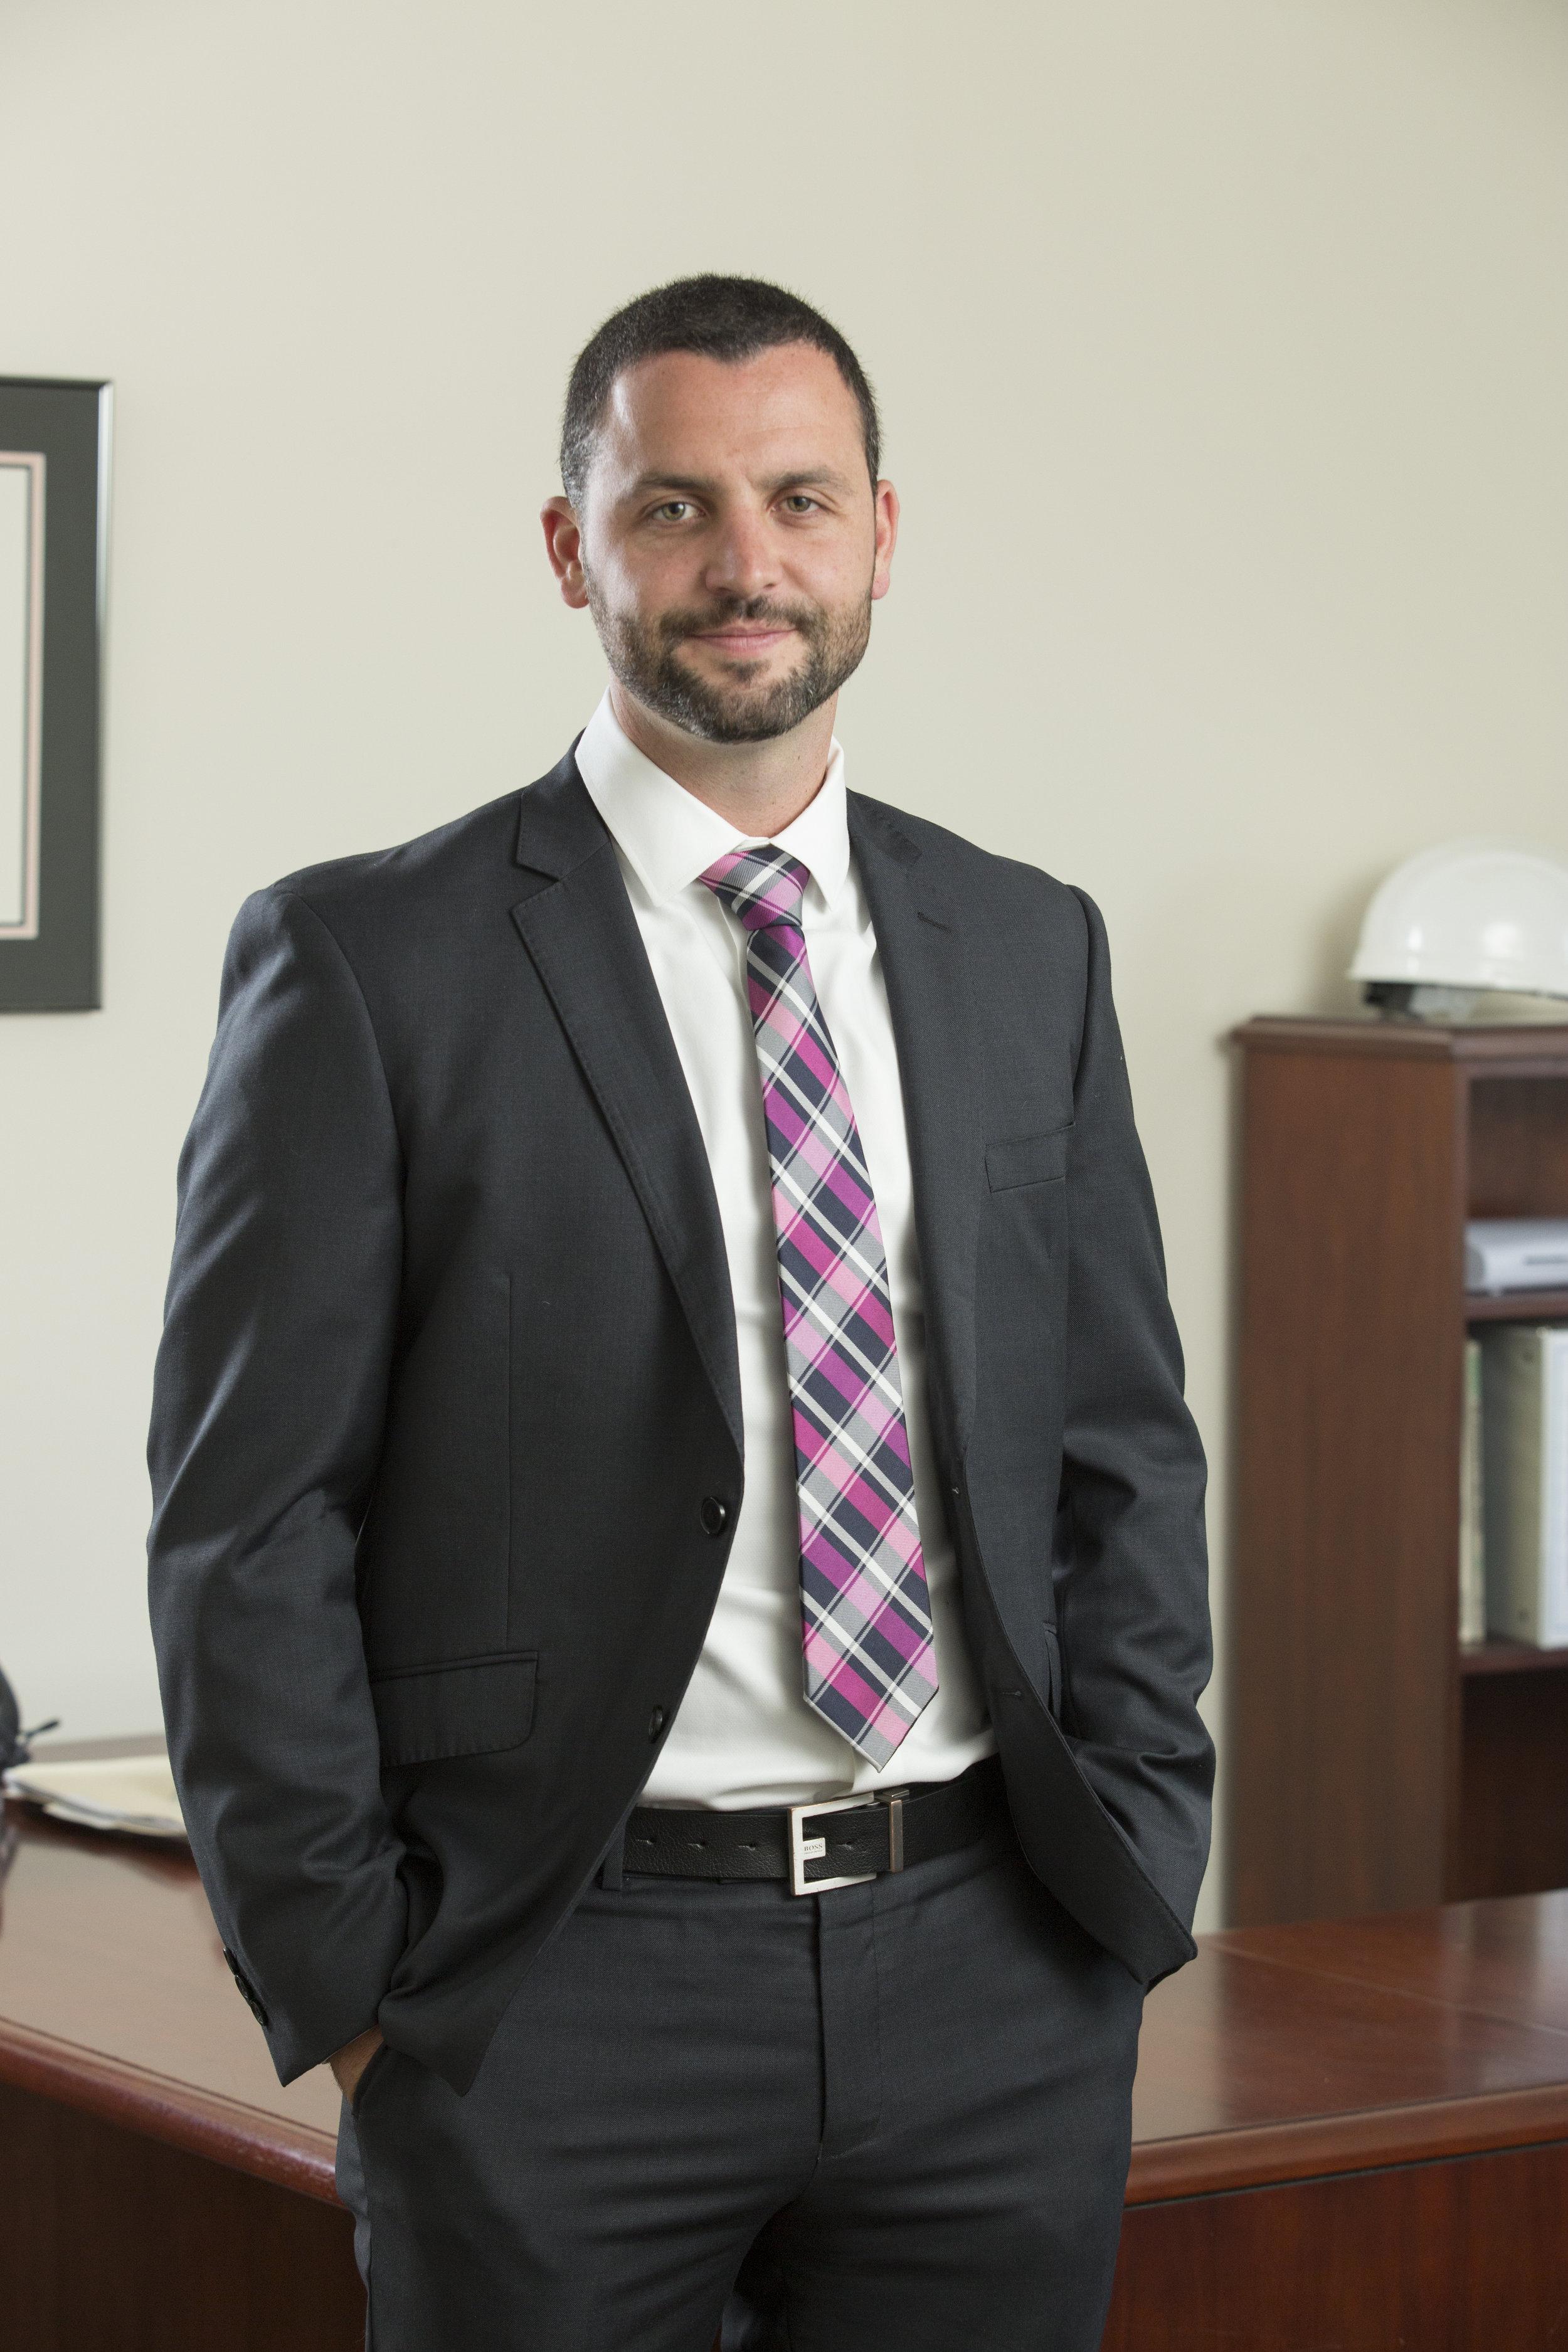 BRENDAN KEARNEY - Manager, Customer Support